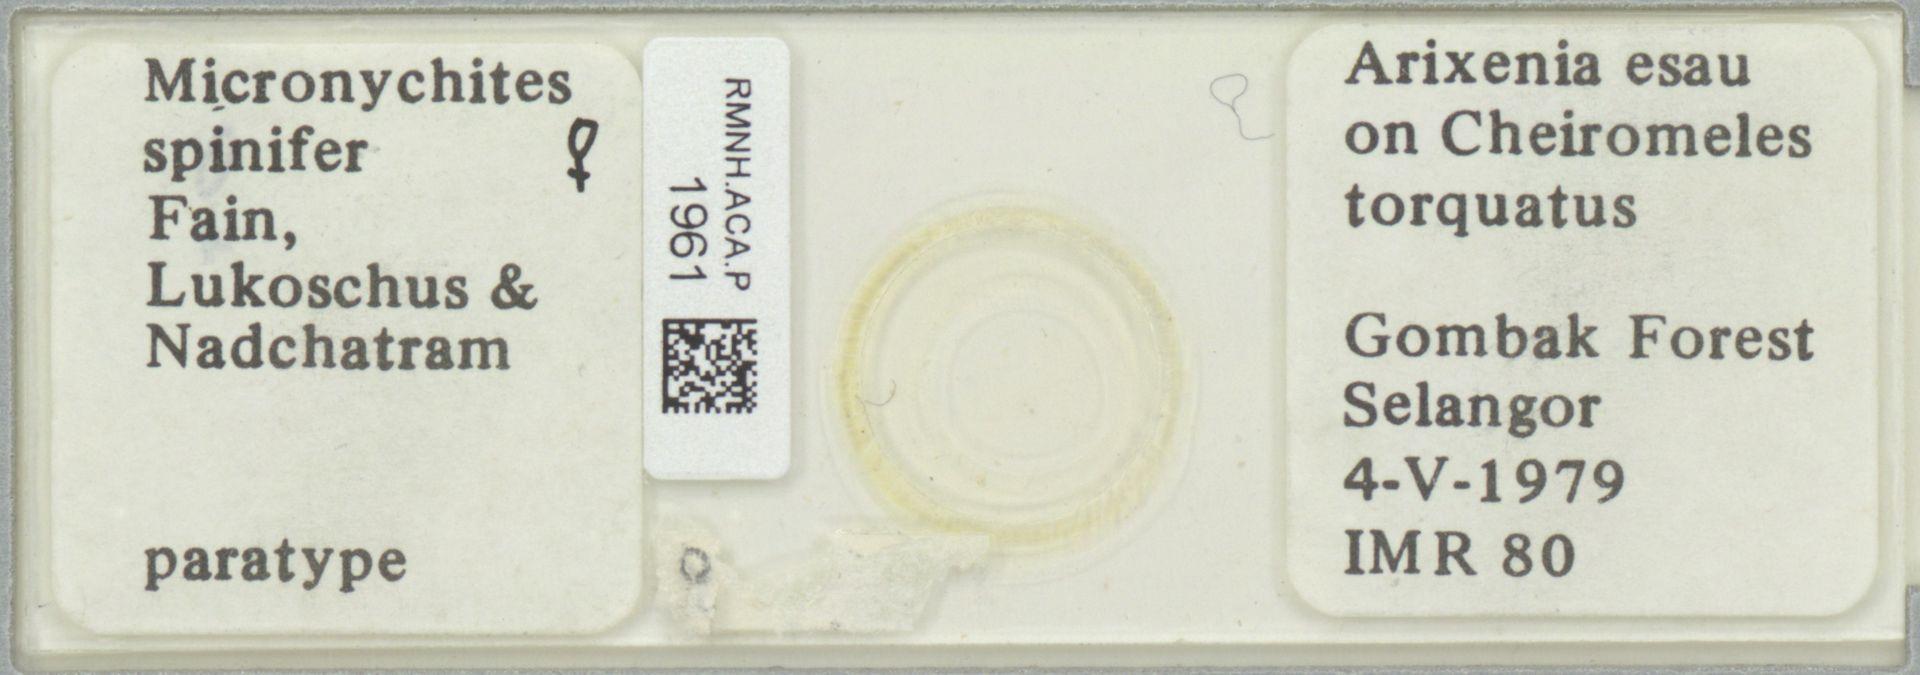 RMNH.ACA.P.1961 | Micronychites spinifer Fain, Lukoschus & Nadchatram